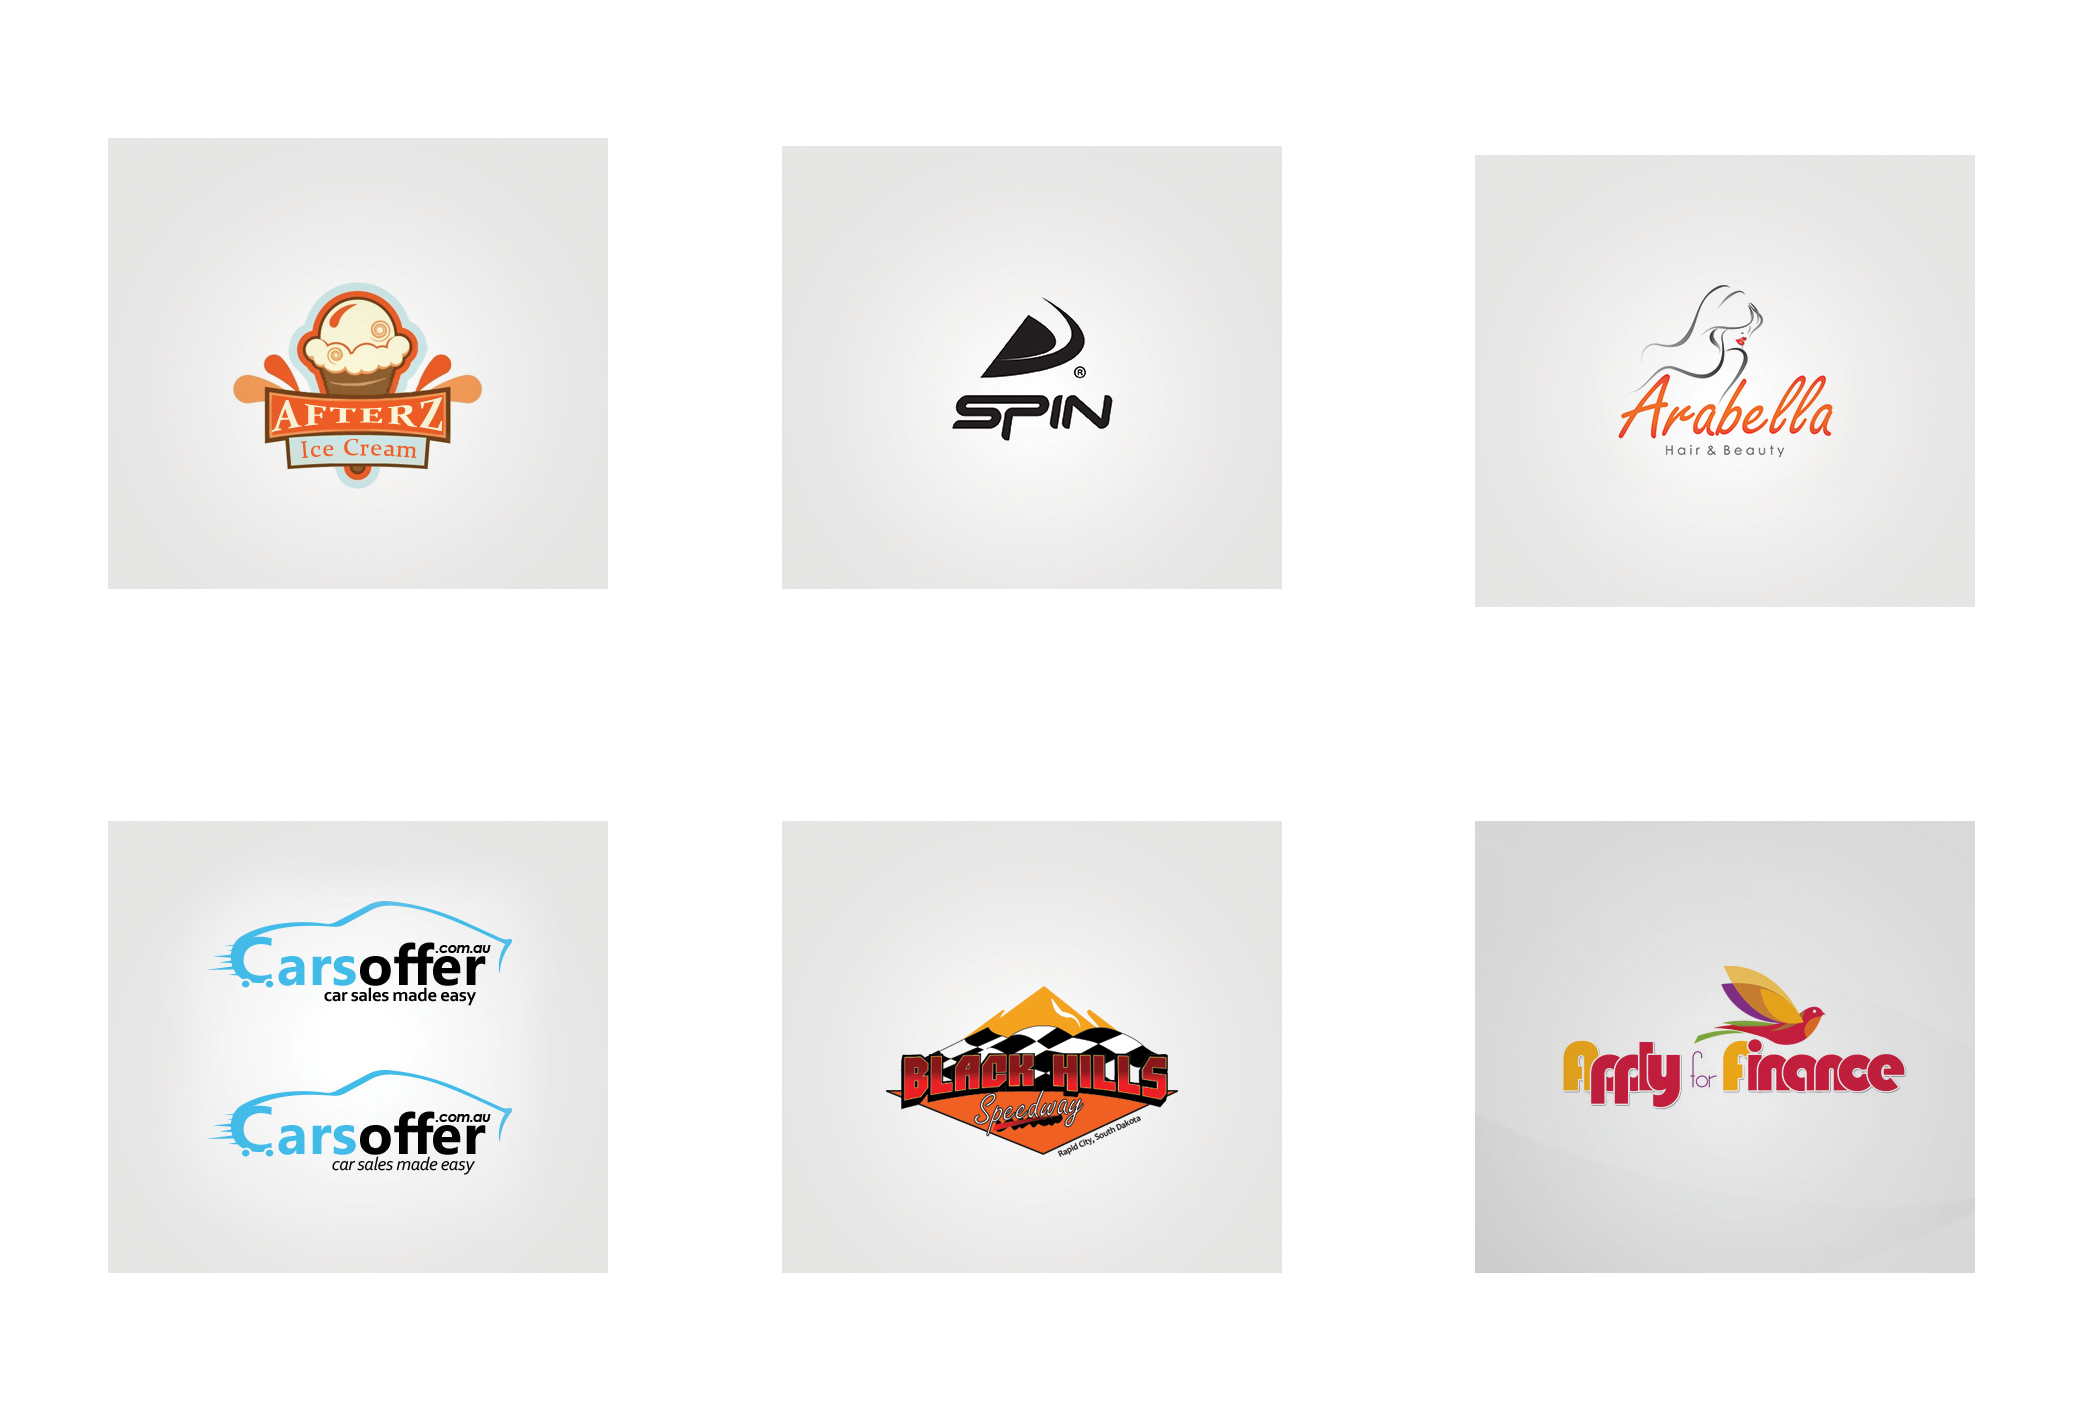 Logo Design by Hamza Riaz - Entry No. 10 in the Logo Design Contest Artistic Logo Design for T & M.